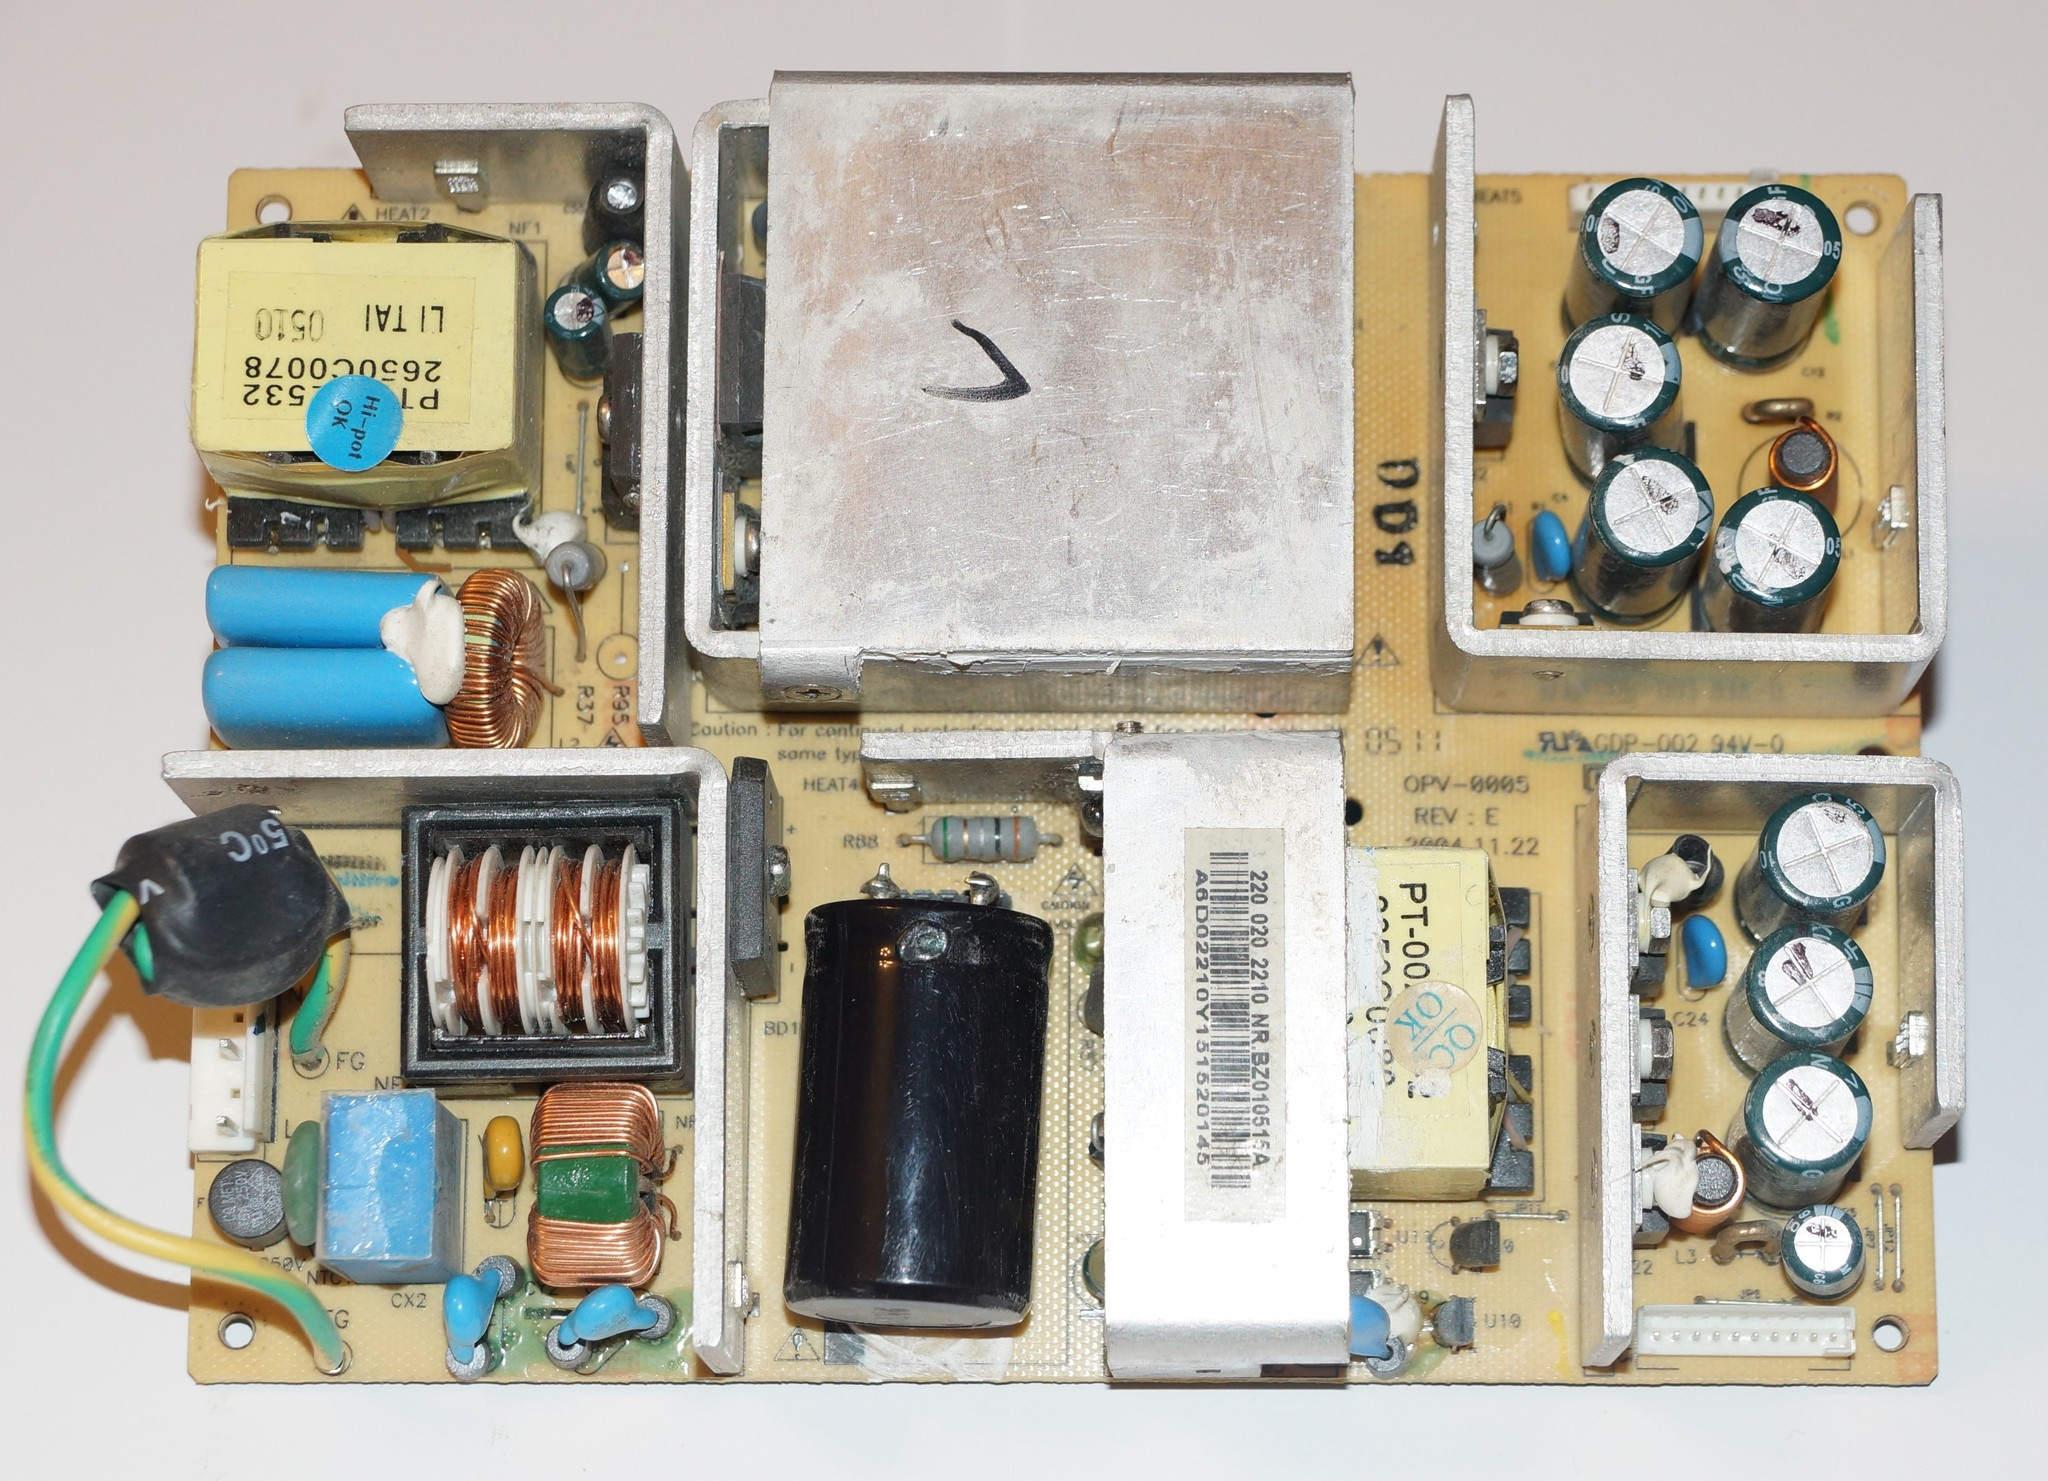 OPV-005 REV:E GDP-002 94V-0 блок питания телевизора Viewsonic